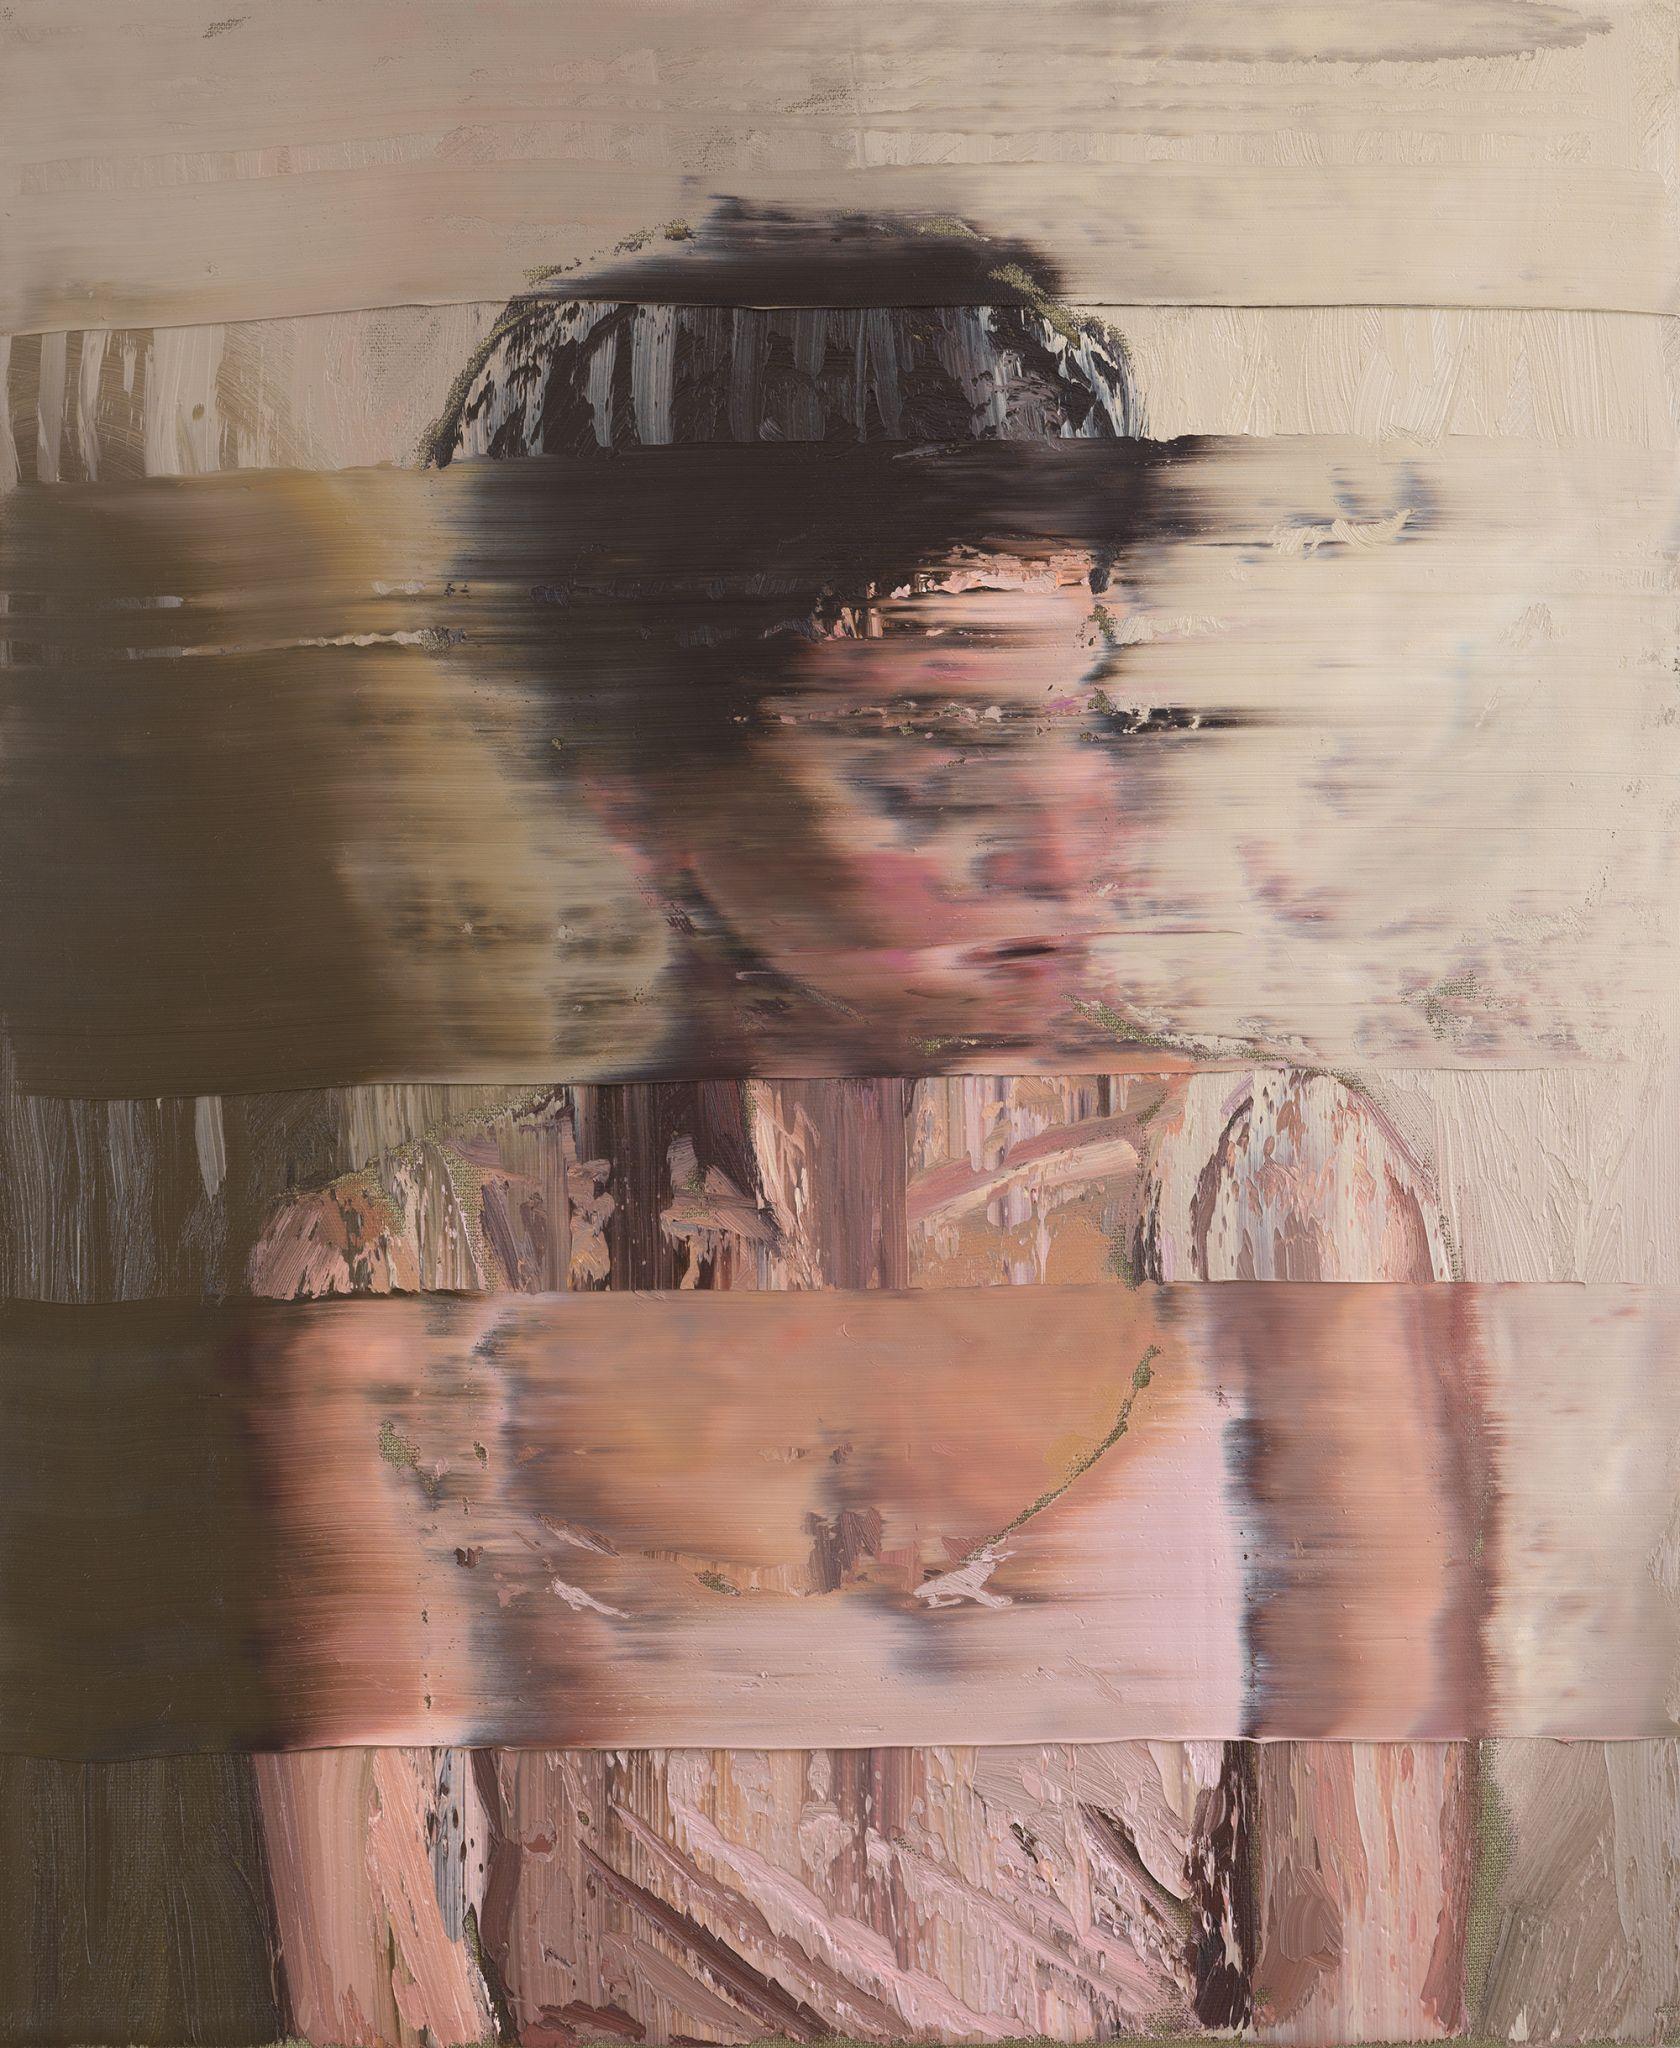 Anatomy of the Mind: legendary artist Andy Denzler's dramatic take on lockdown